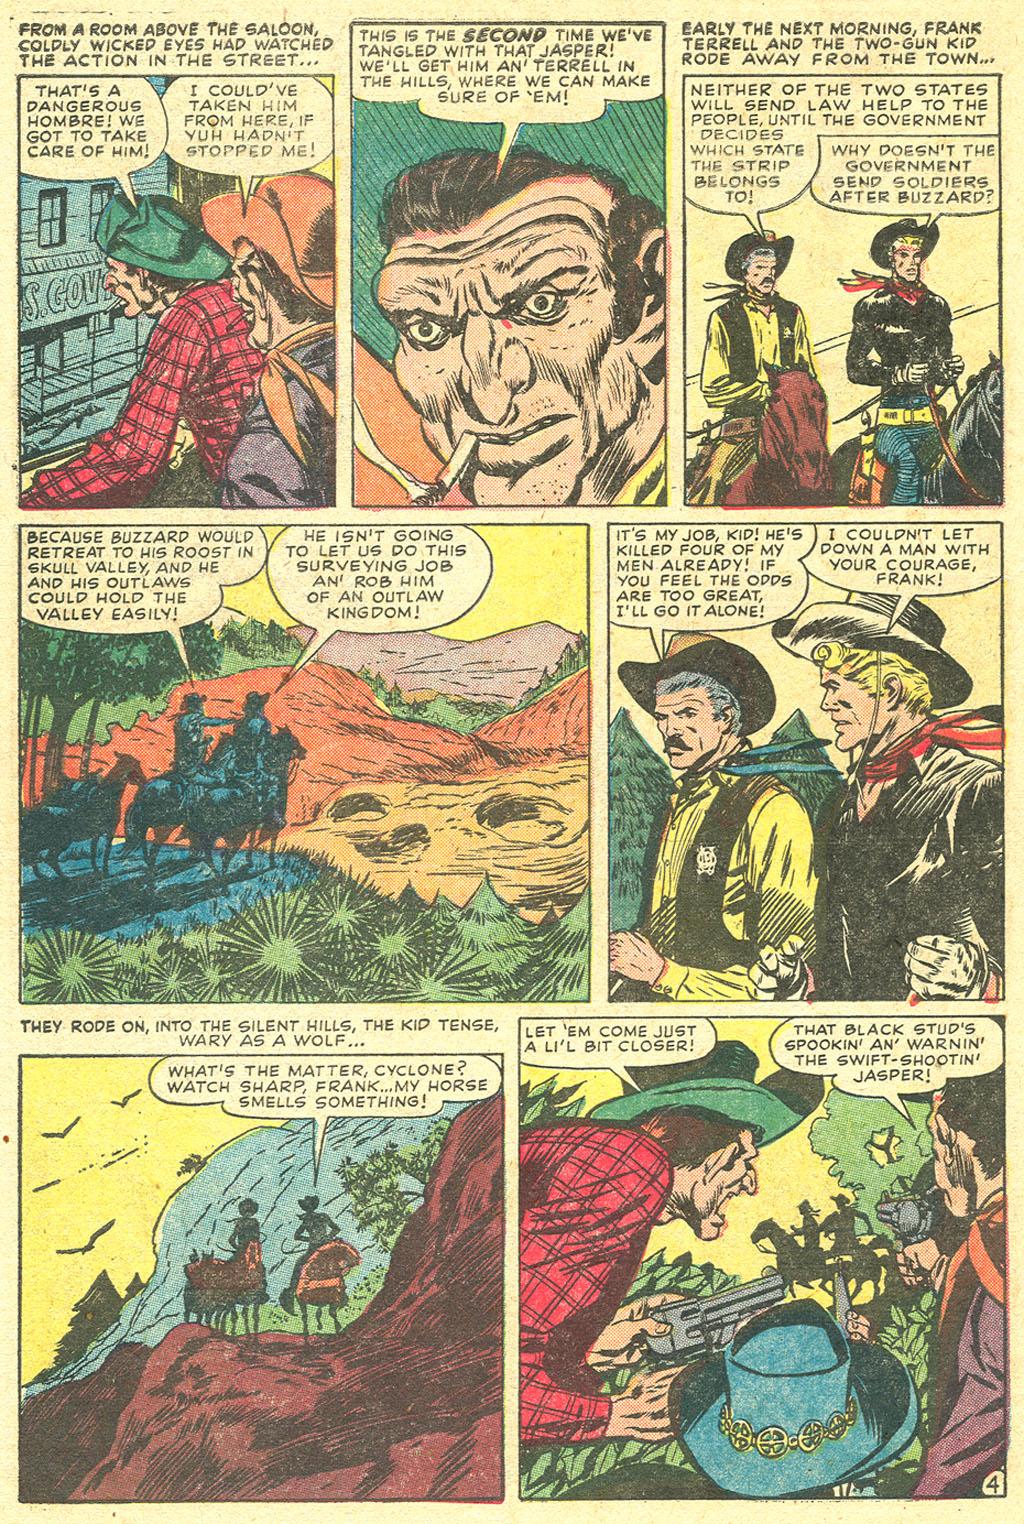 Read online Two-Gun Kid comic -  Issue #21 - 30